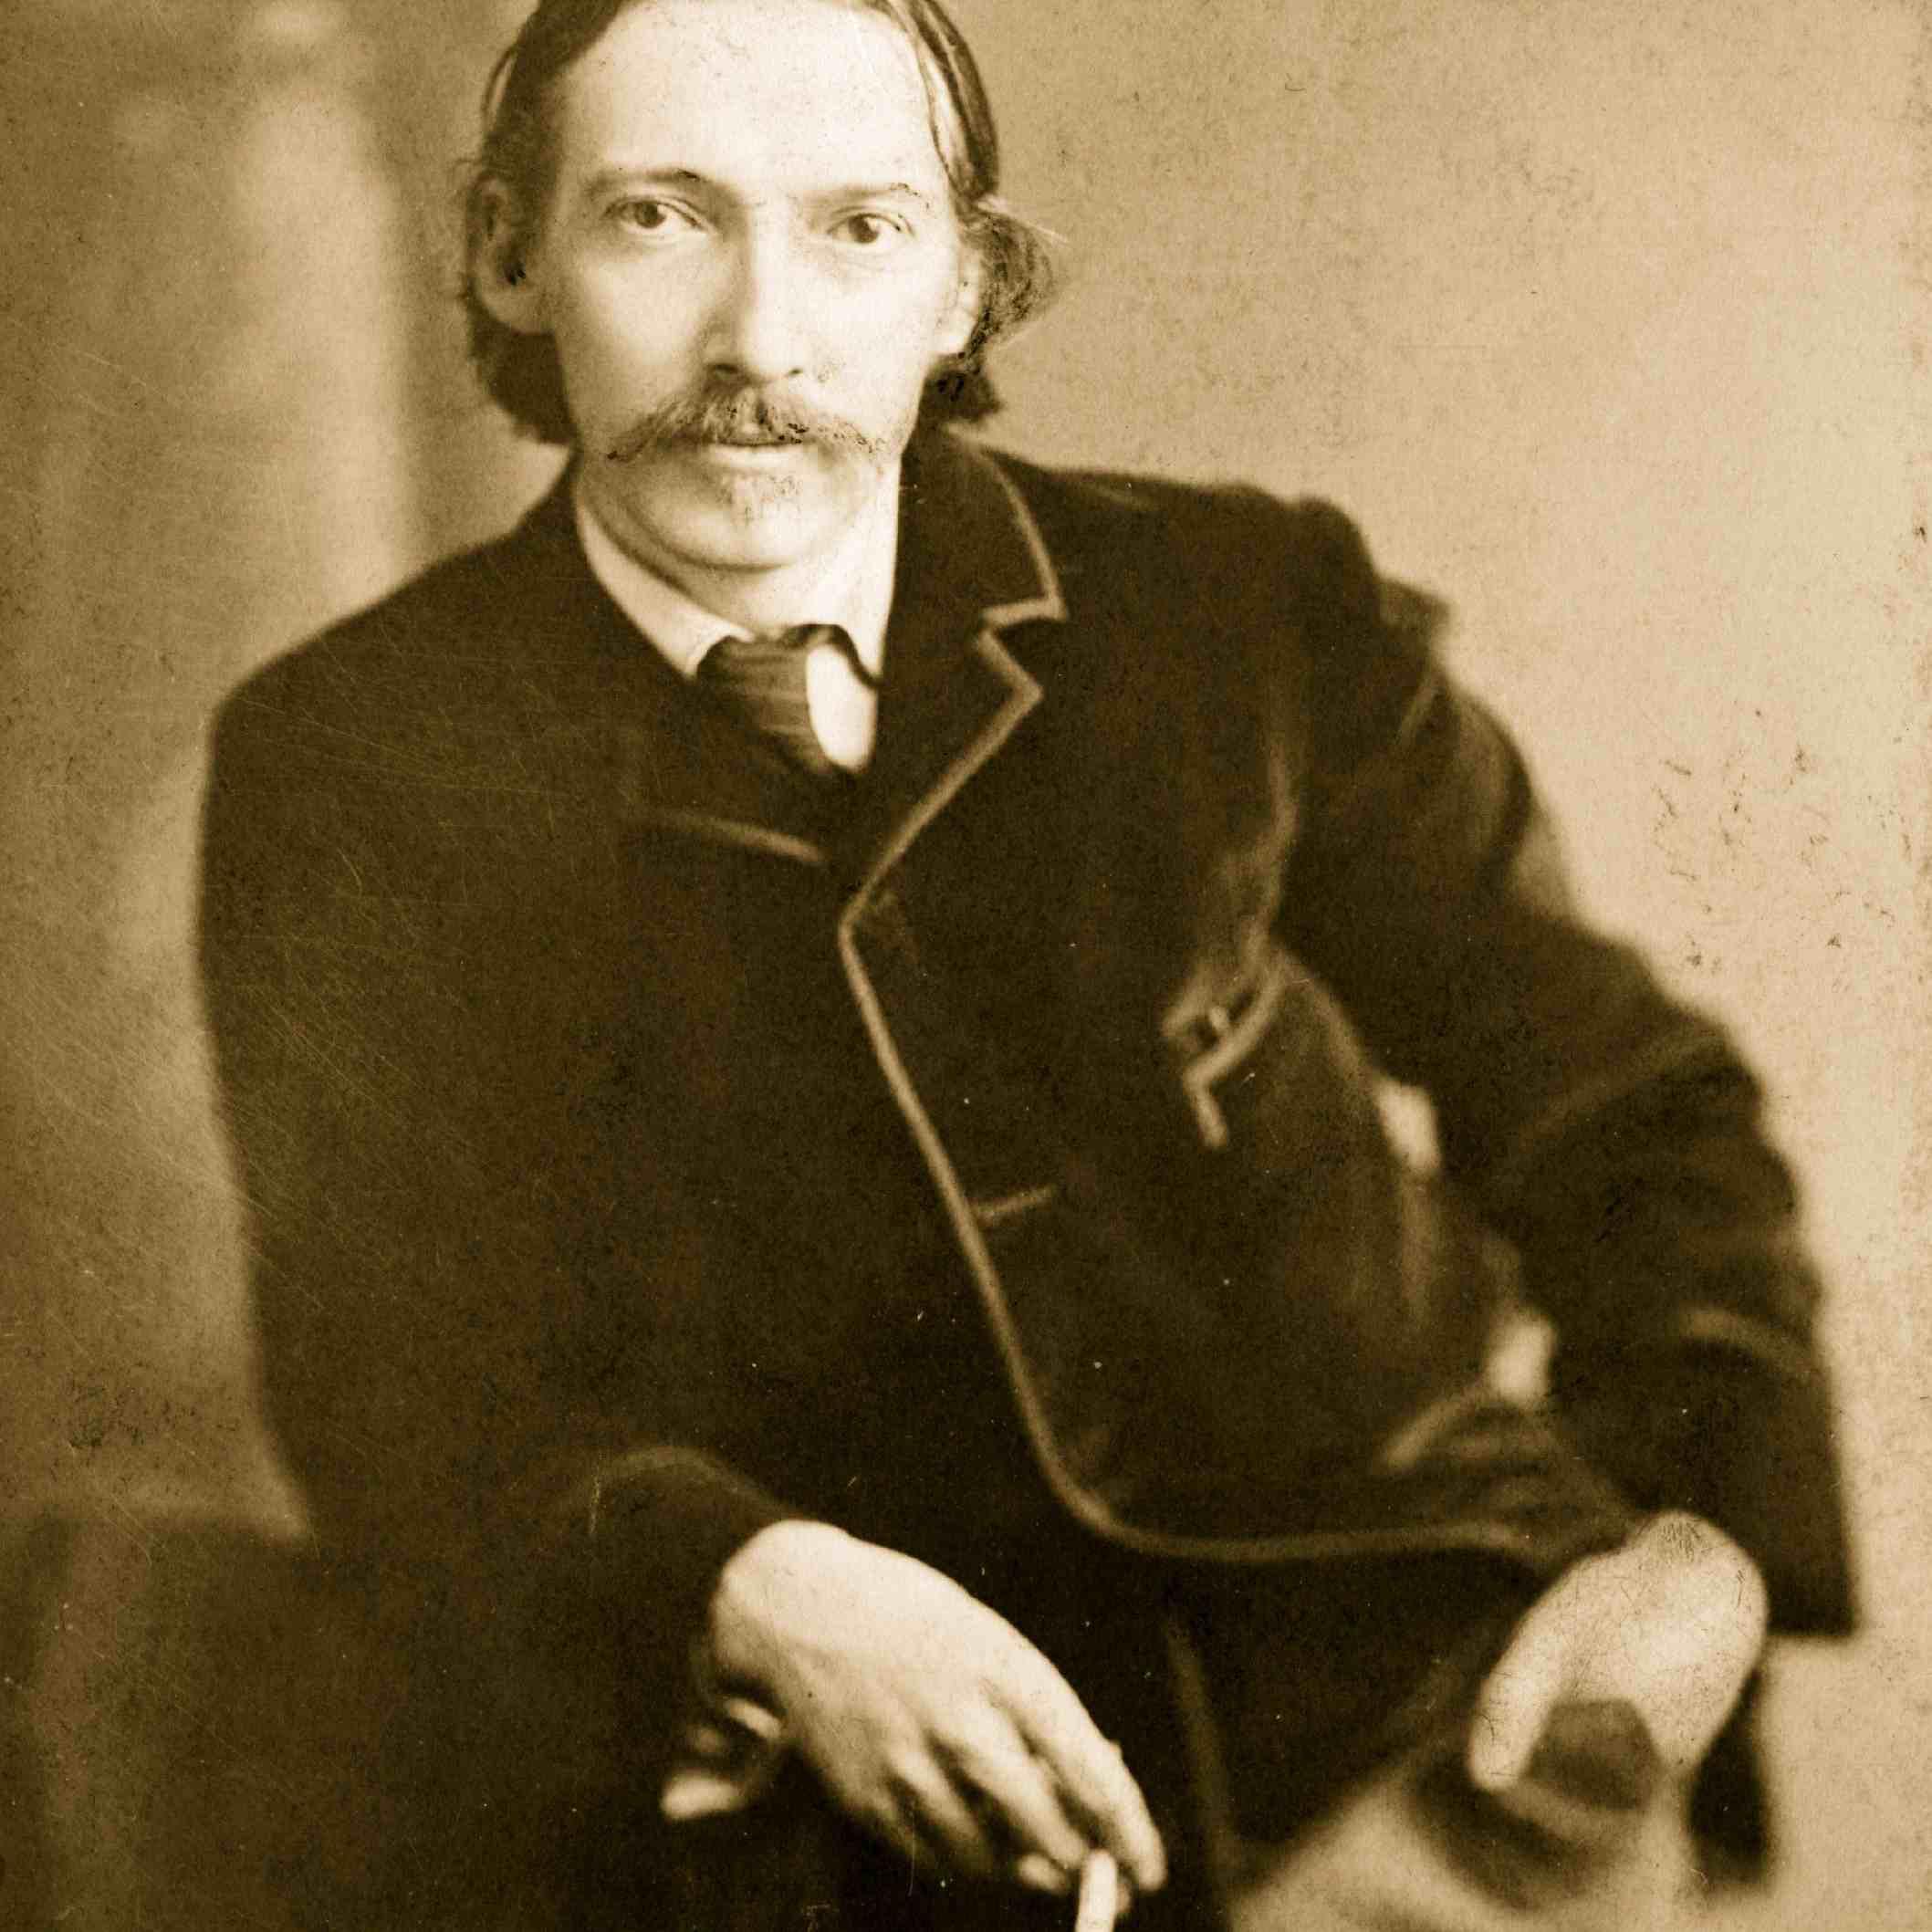 Robert Louis Stevenson in 1880